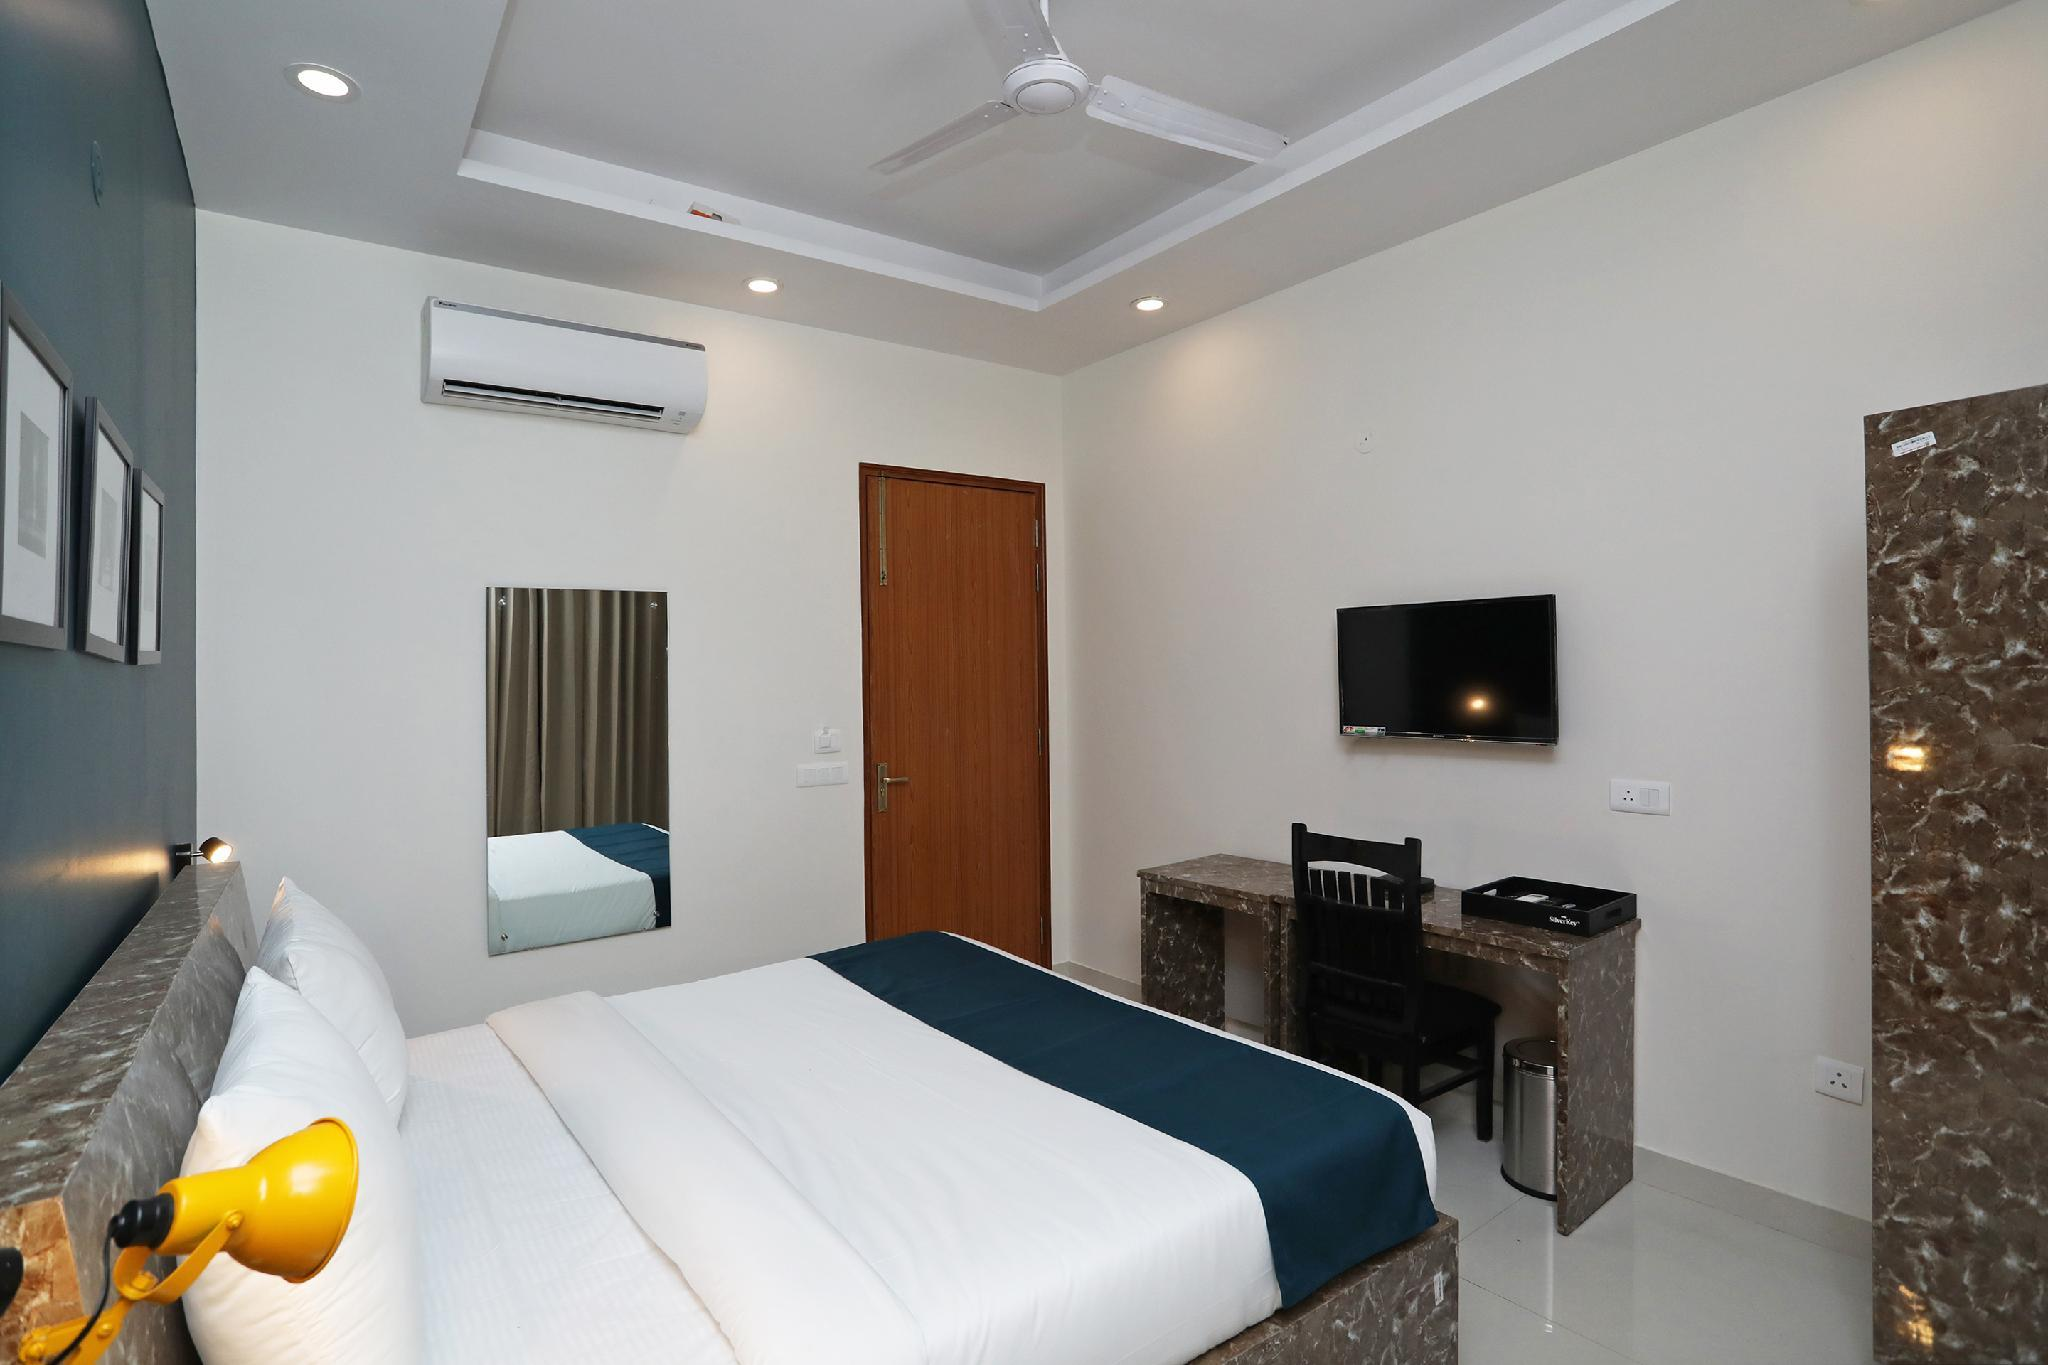 SilverKey Executive Stays 40971 Netaji Subhash Marg